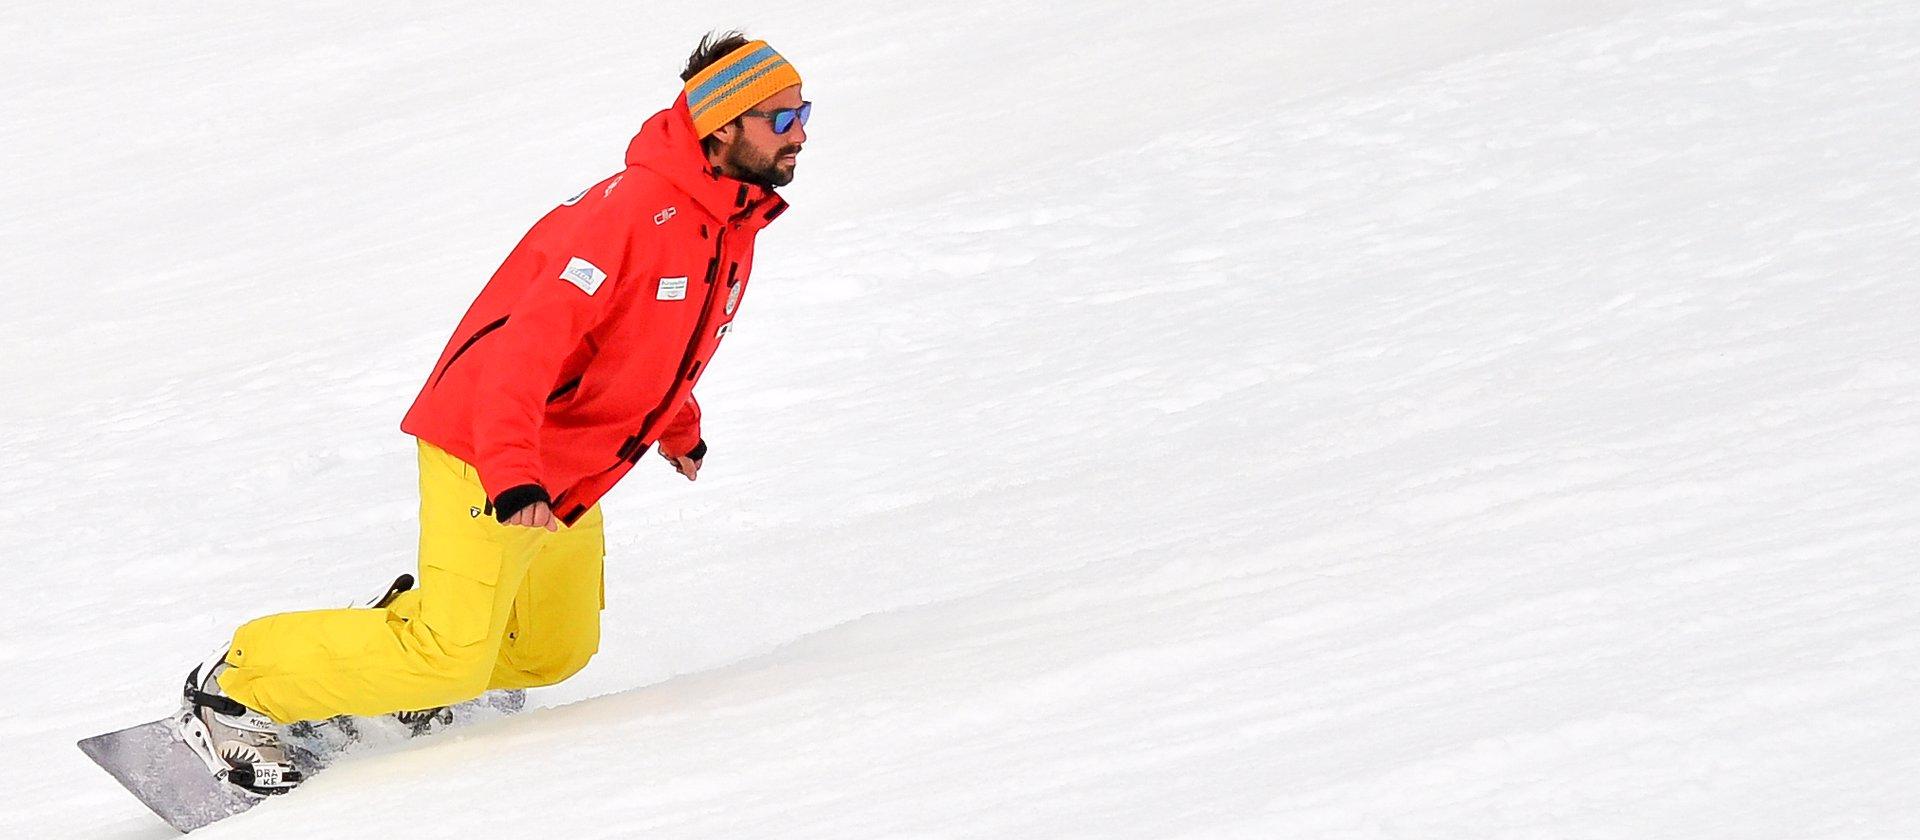 maestro snowboard w